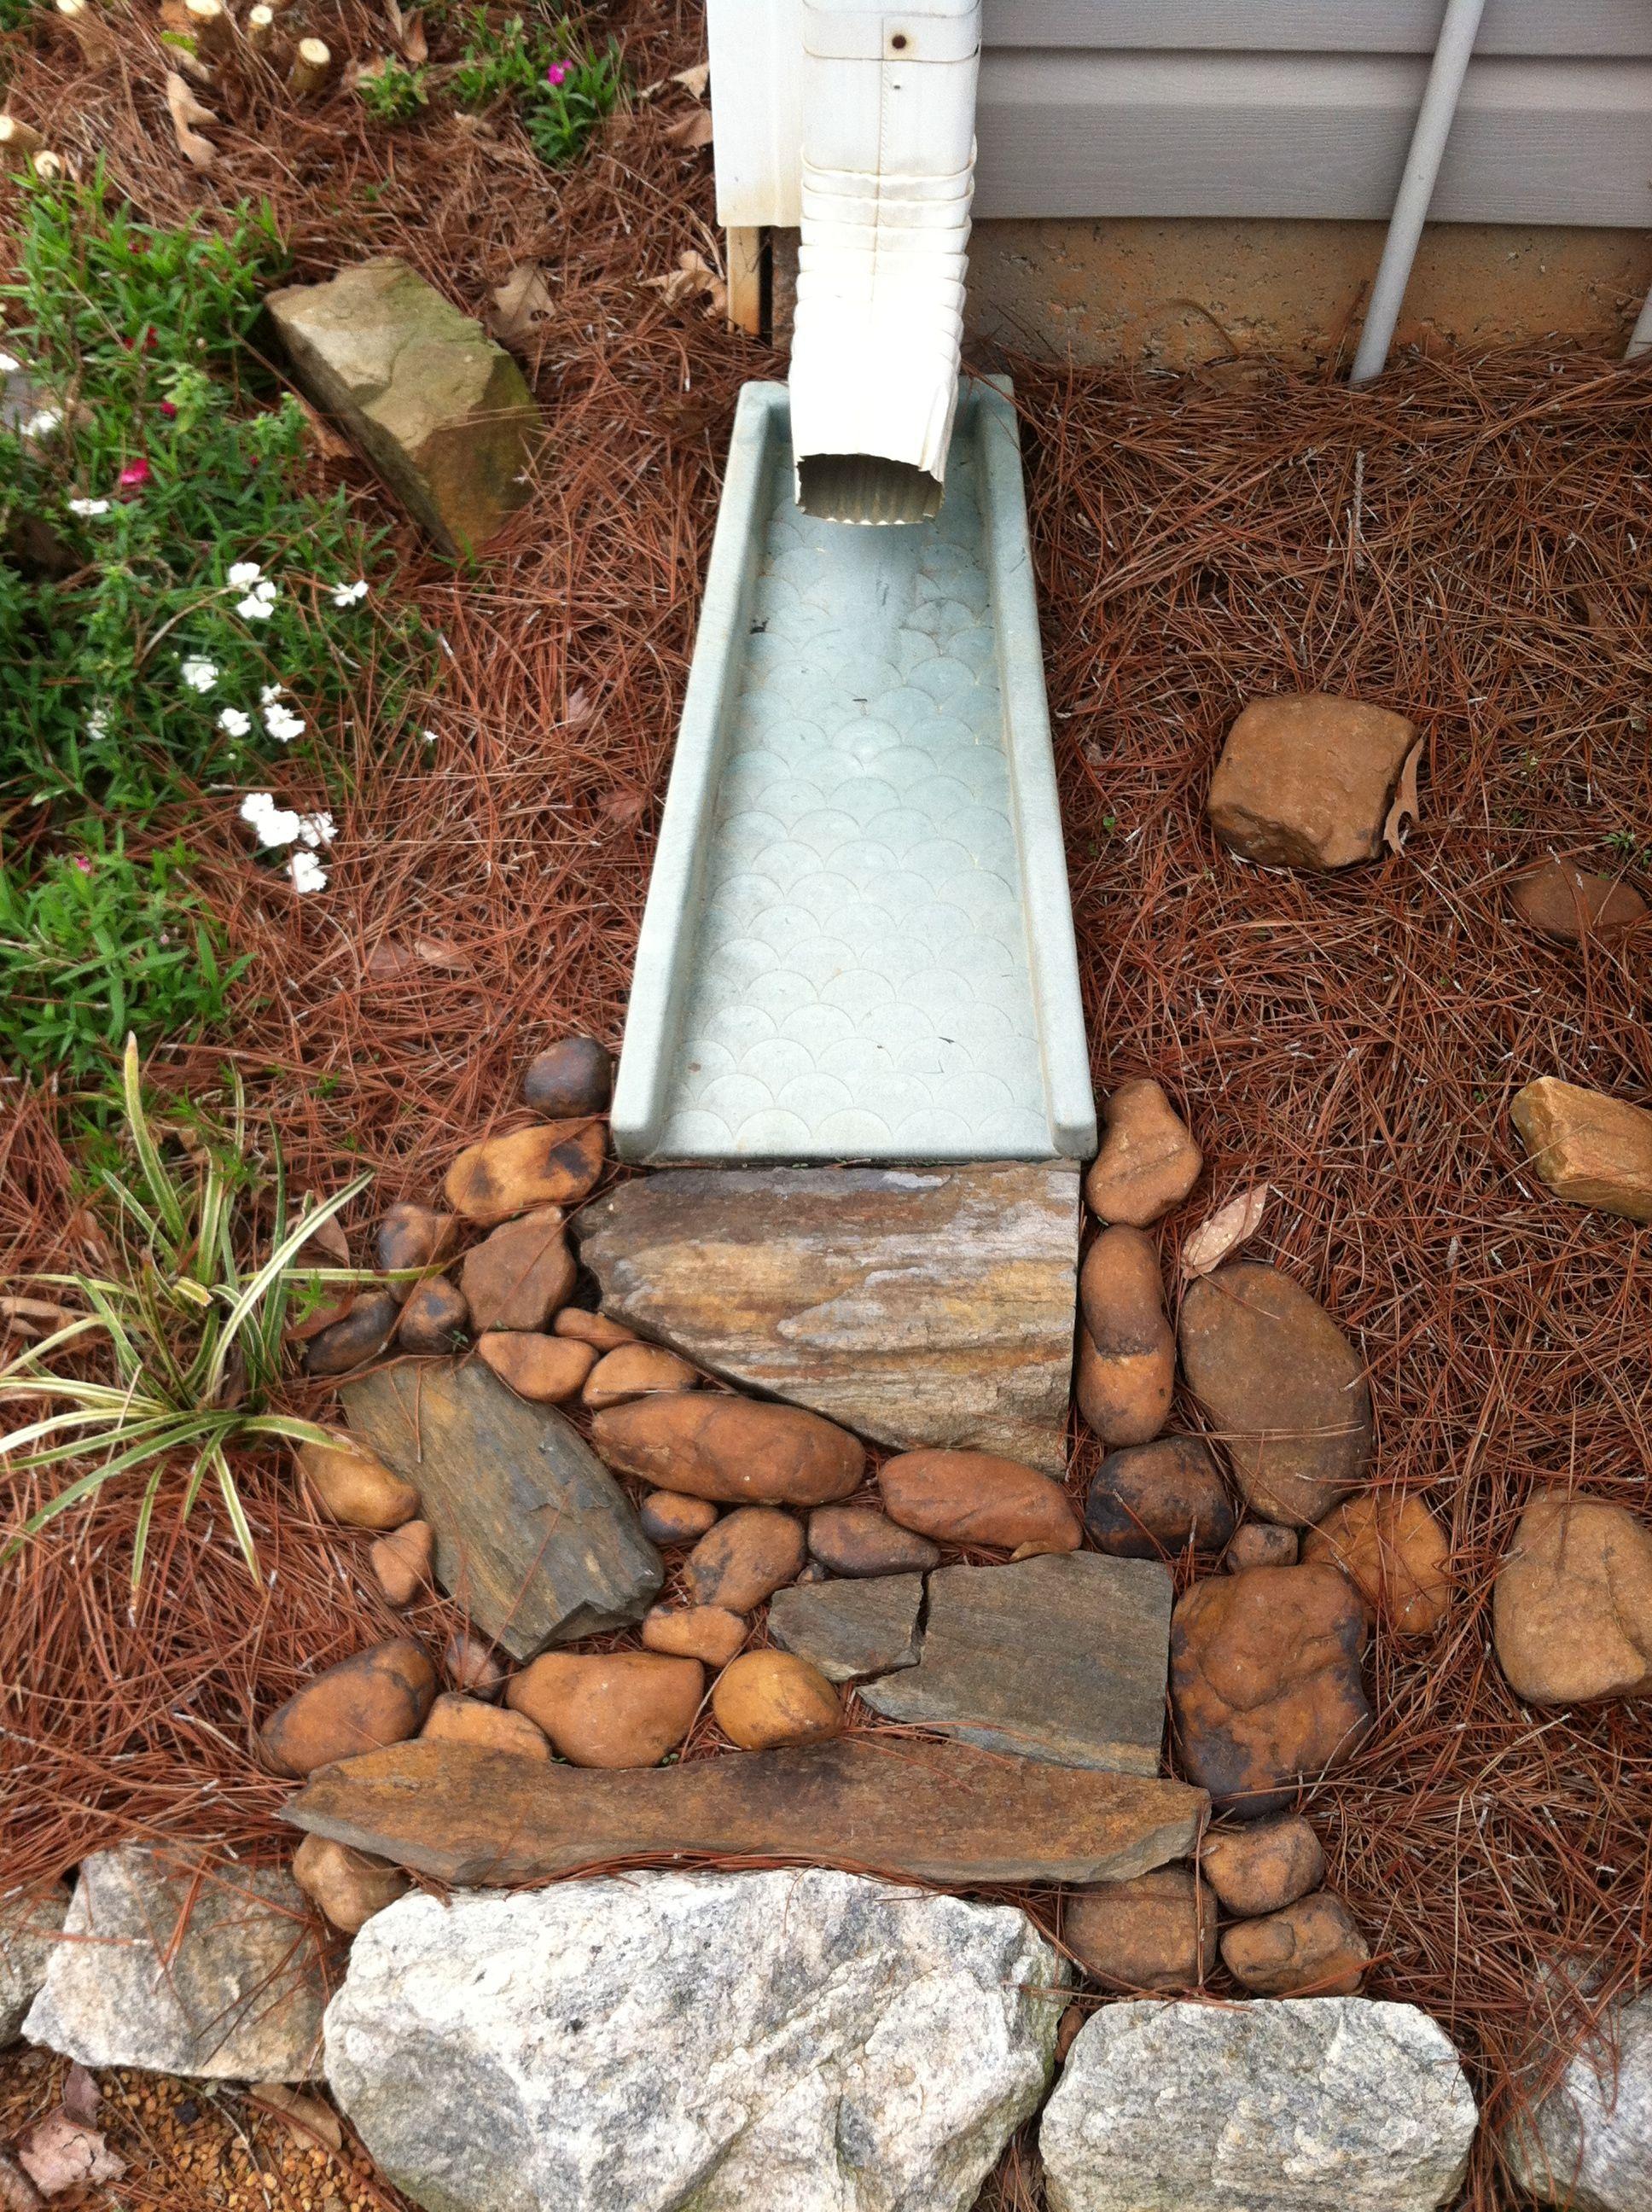 Runoff rocks | #FortMill #SouthCarolina #Stormwater #Flooding ...